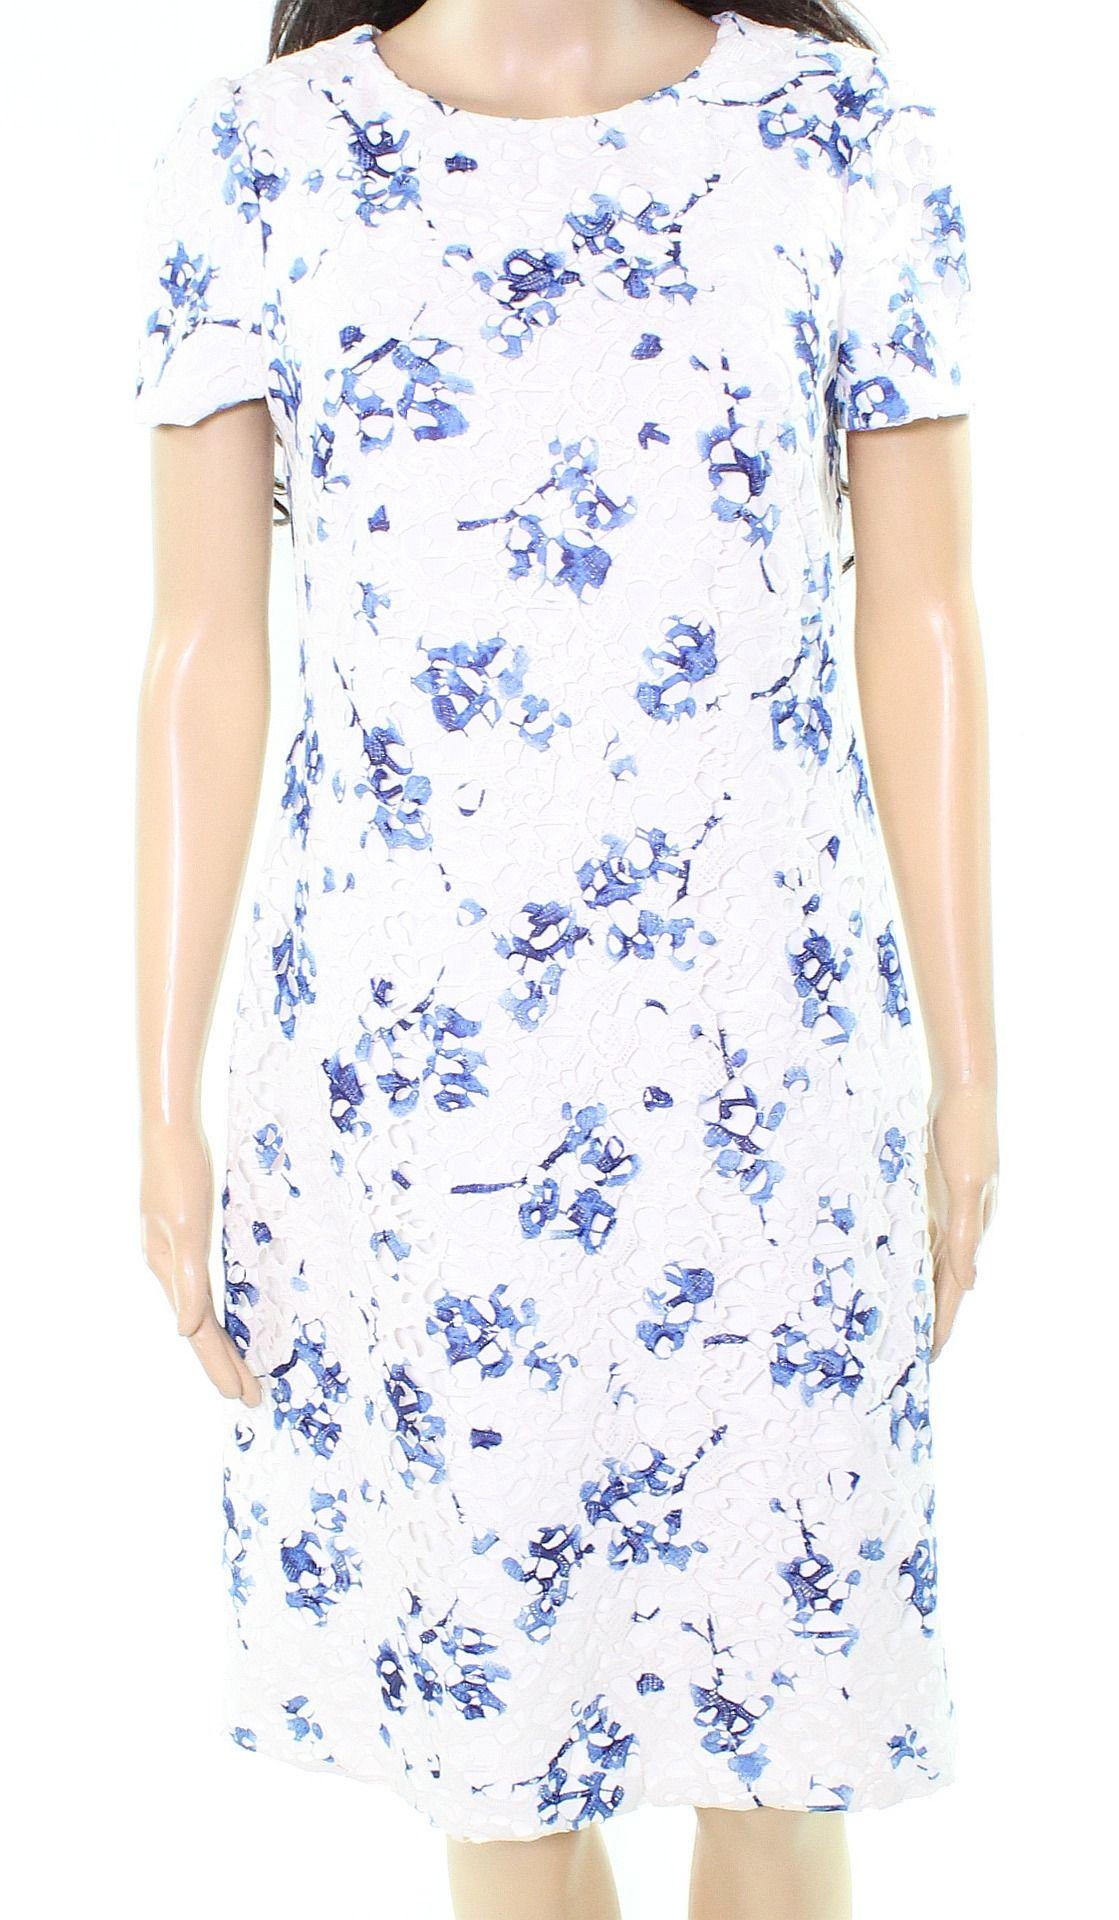 Lauren by Ralph Lauren Women's White Size 4 Floral Laced Sheath Dress